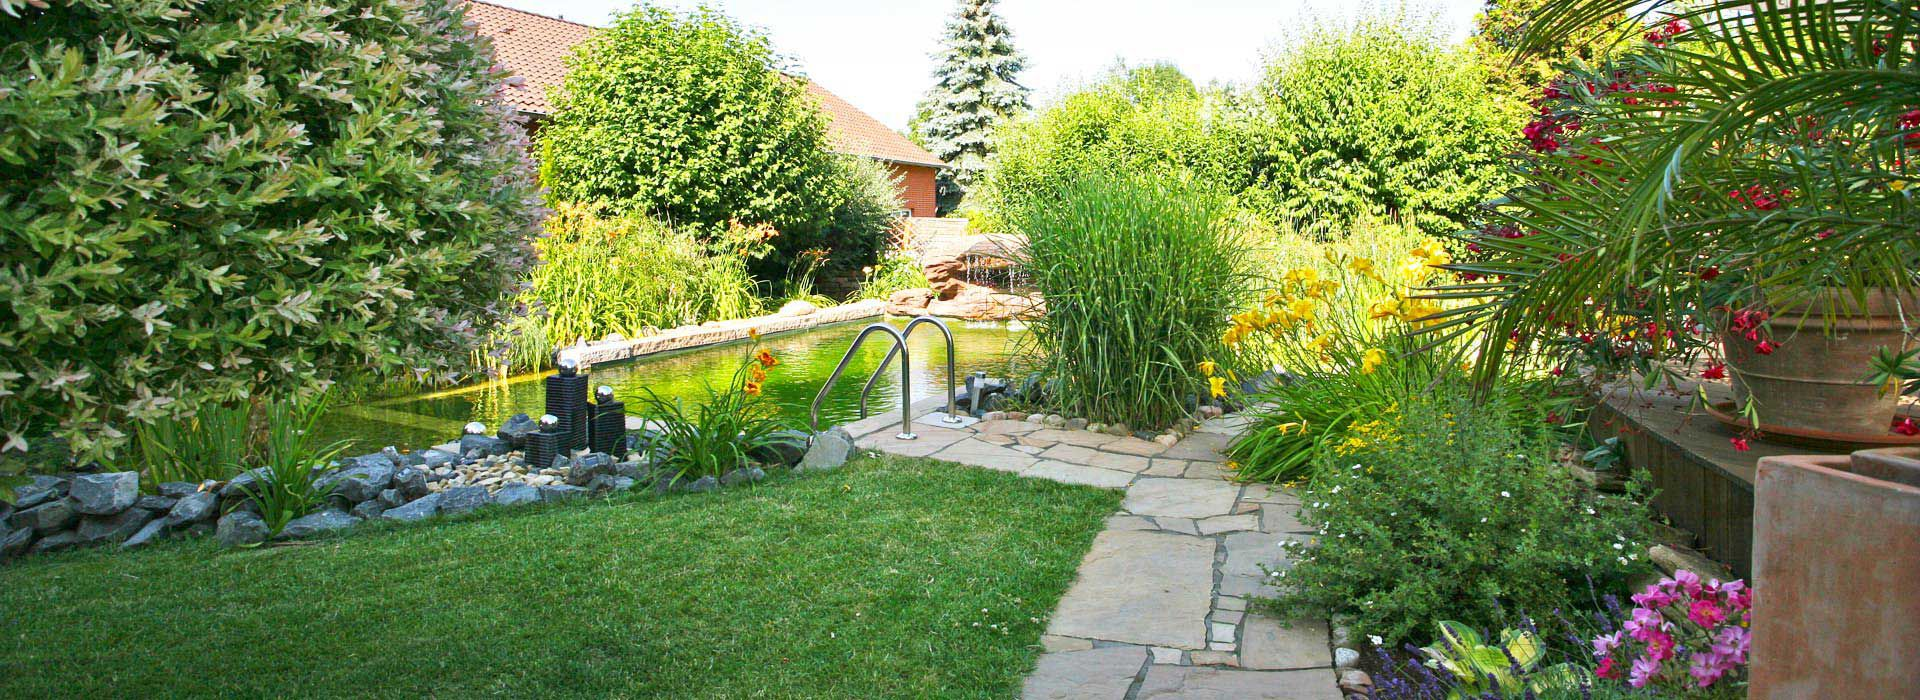 Moderne gartengestaltung eine auswahl an gartenideen for Gartengestaltung 24